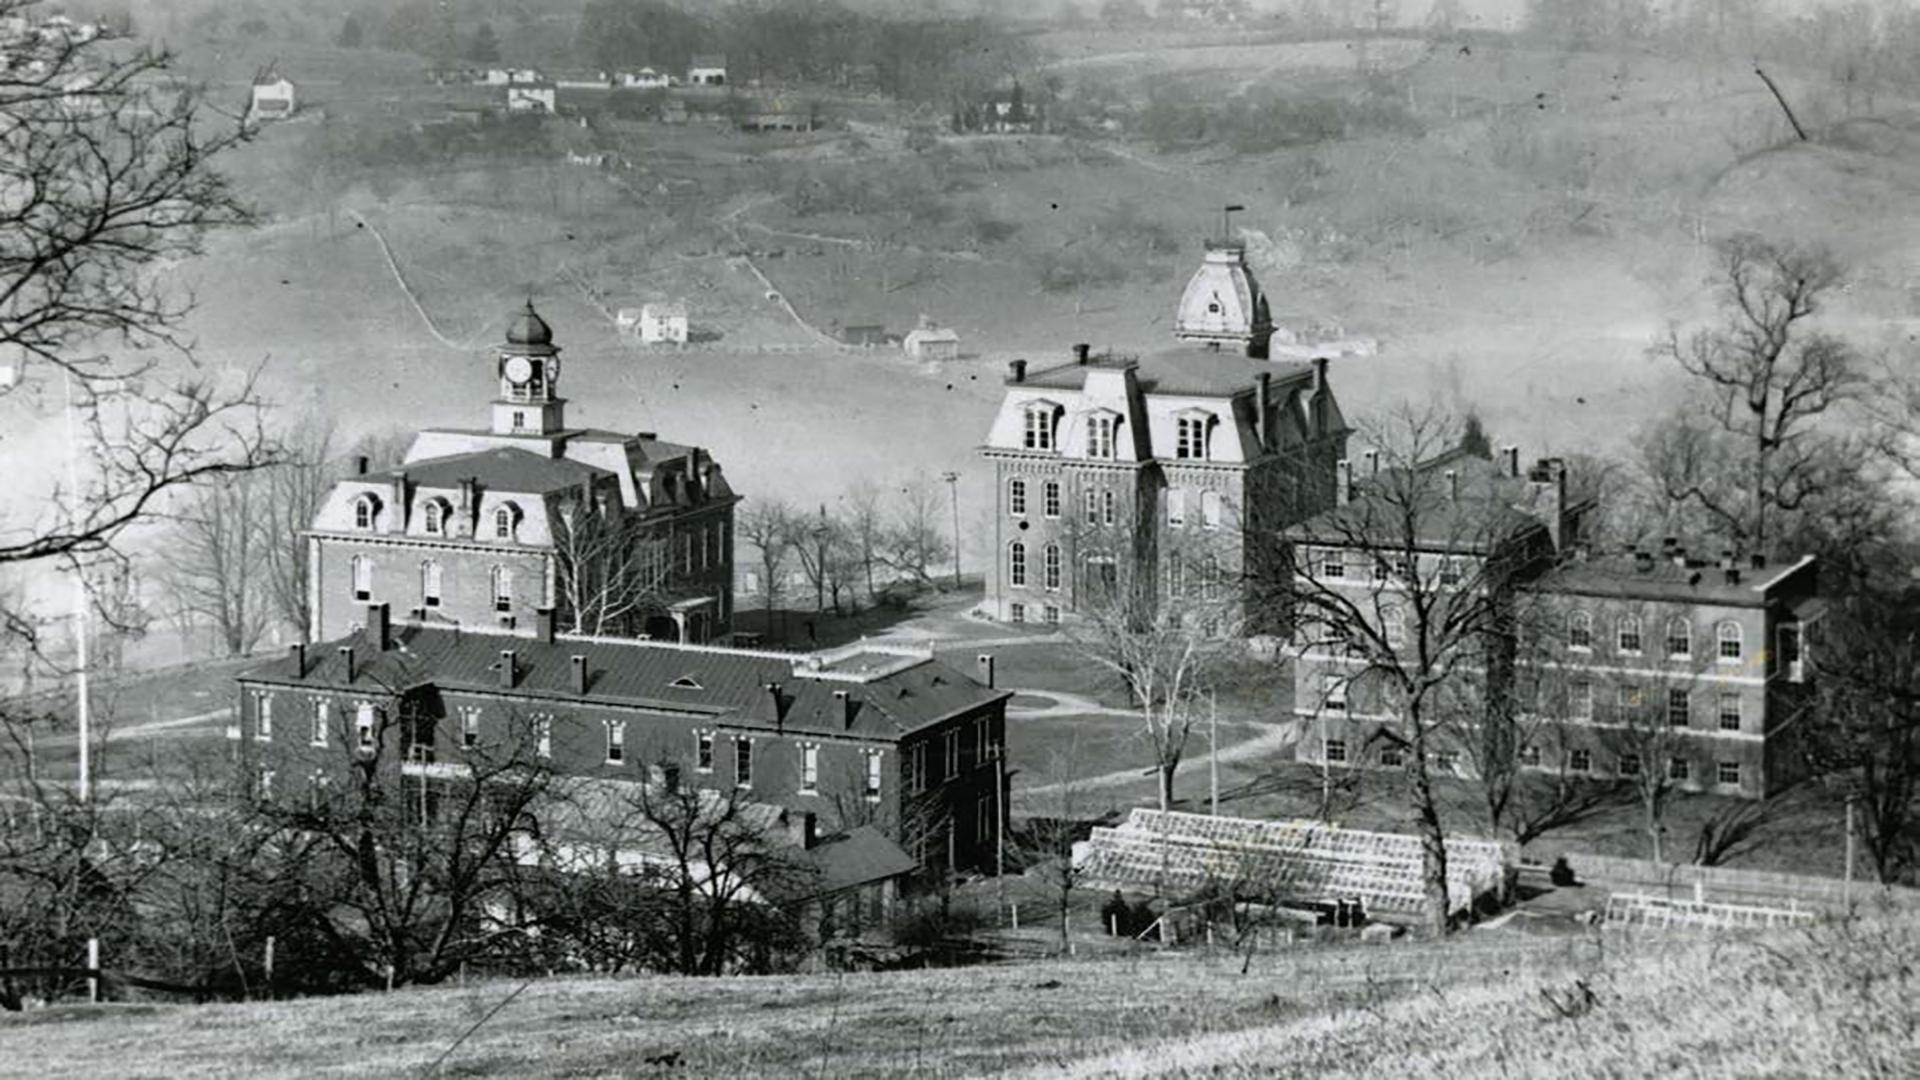 Lewis University Athletics >> West Virginia Day program explores WVU history | WVU Today ...